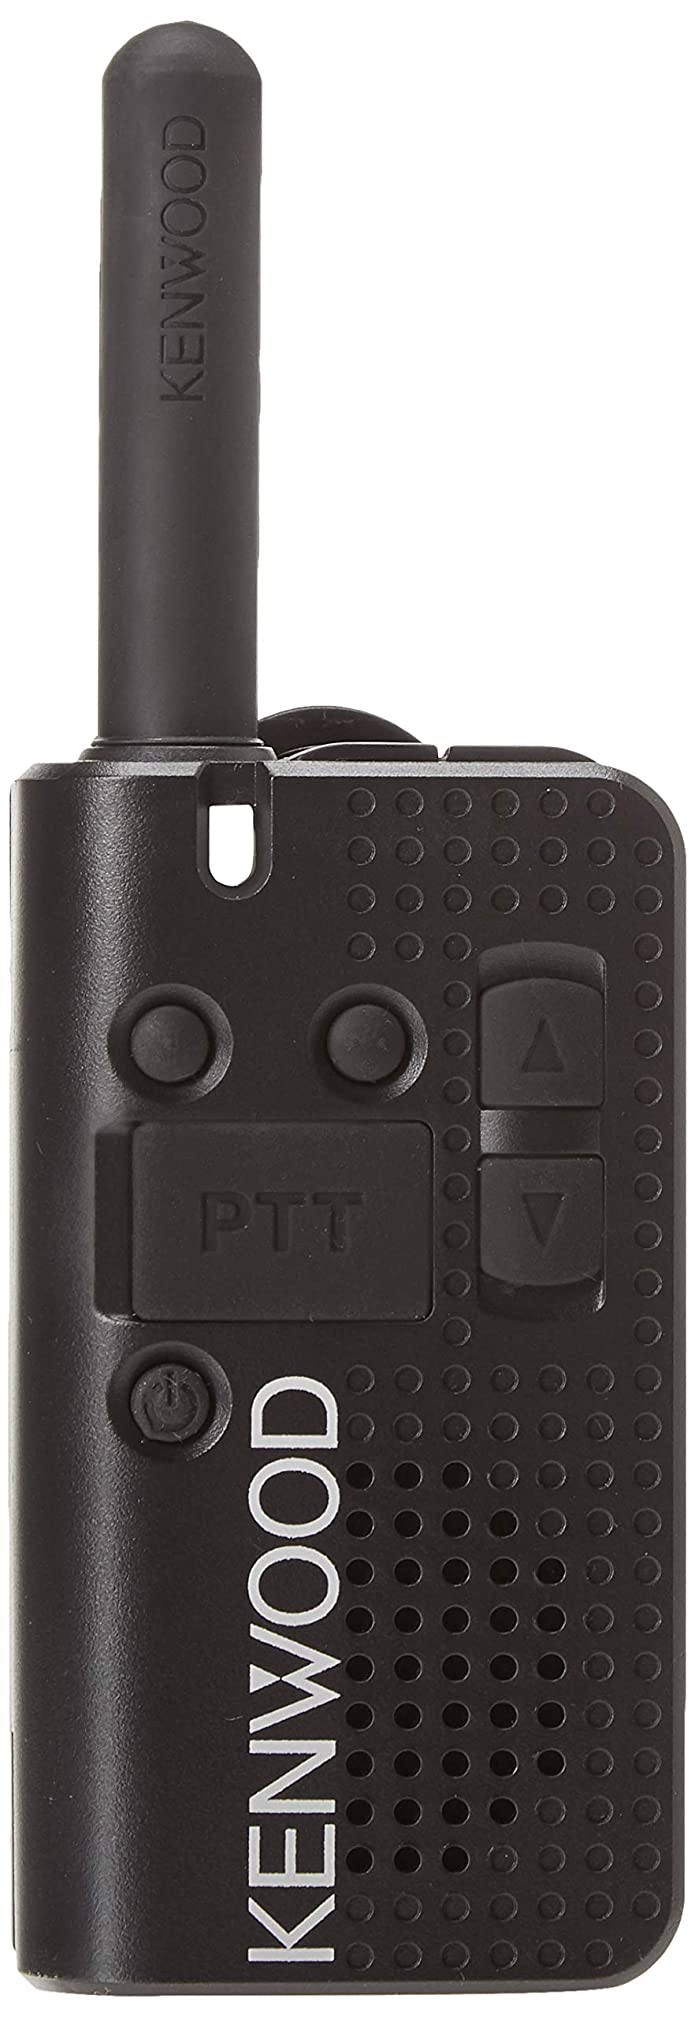 Kenwood ProTalk®PKT-23 UHF 2-Way Business Radio